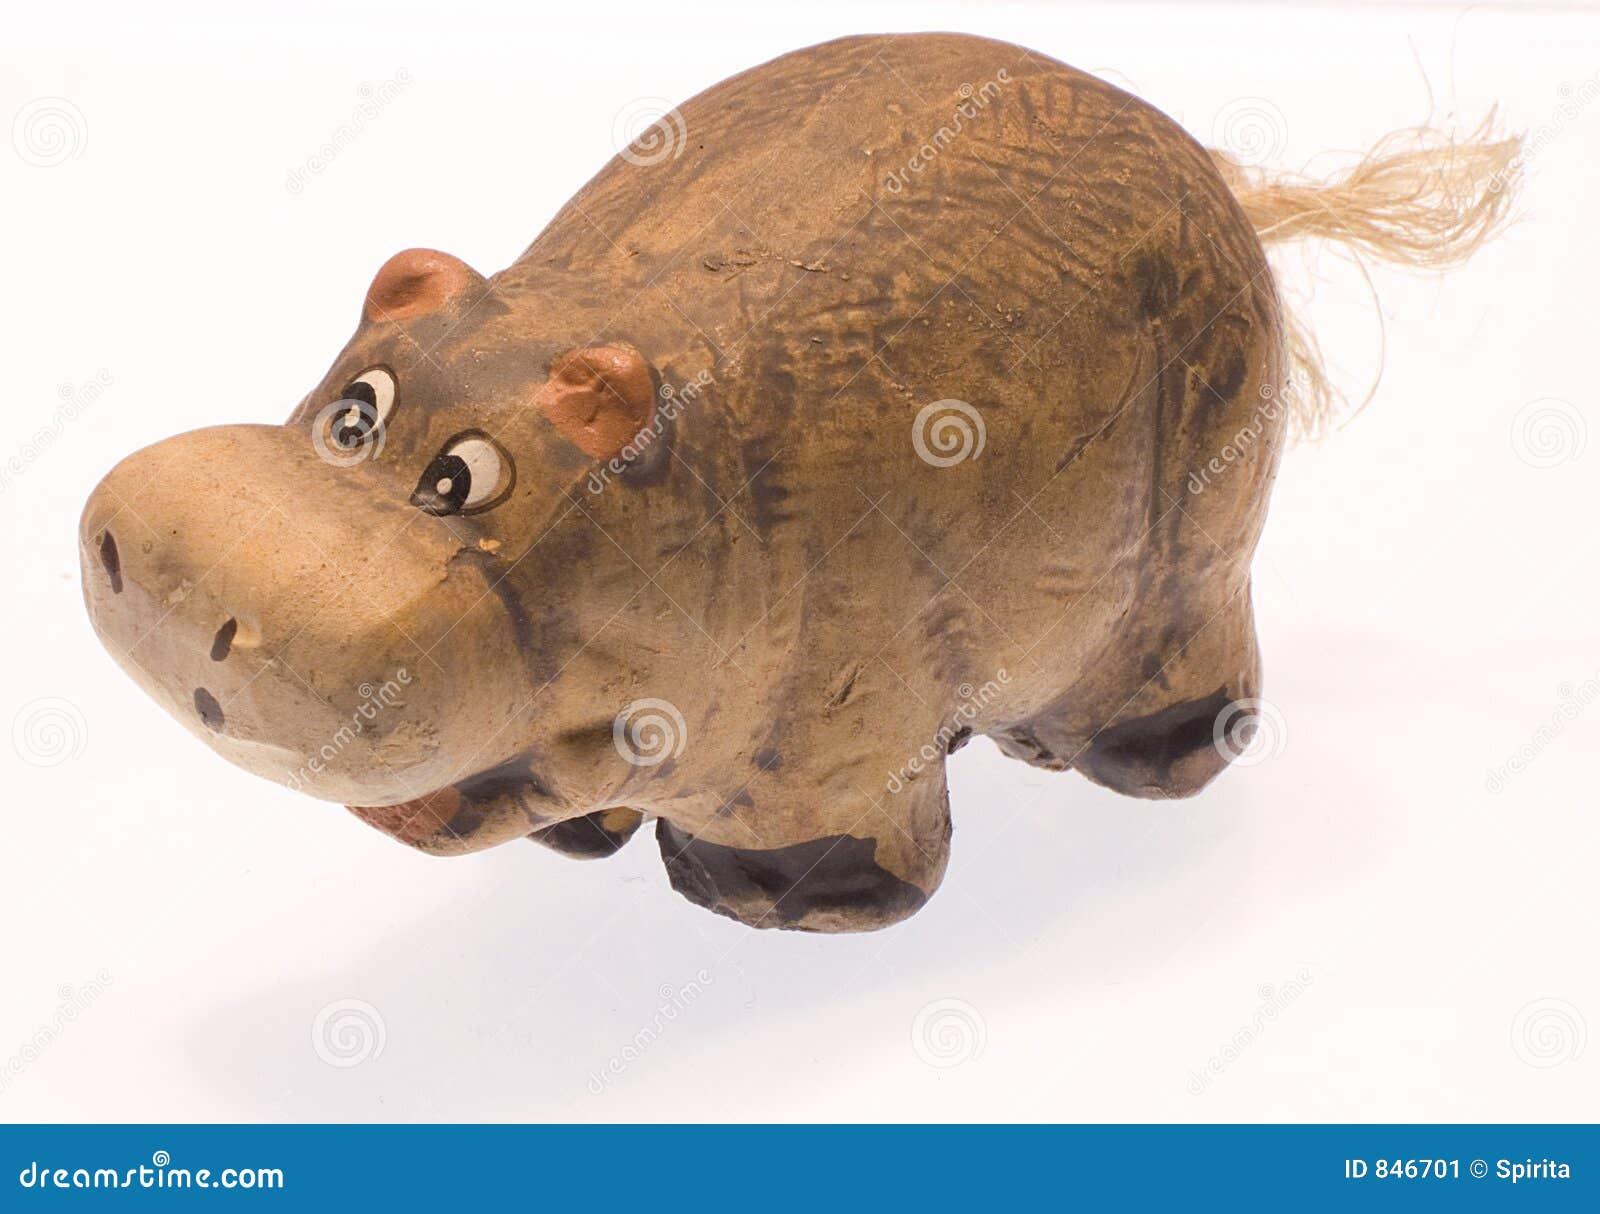 Clay hippopotamus I